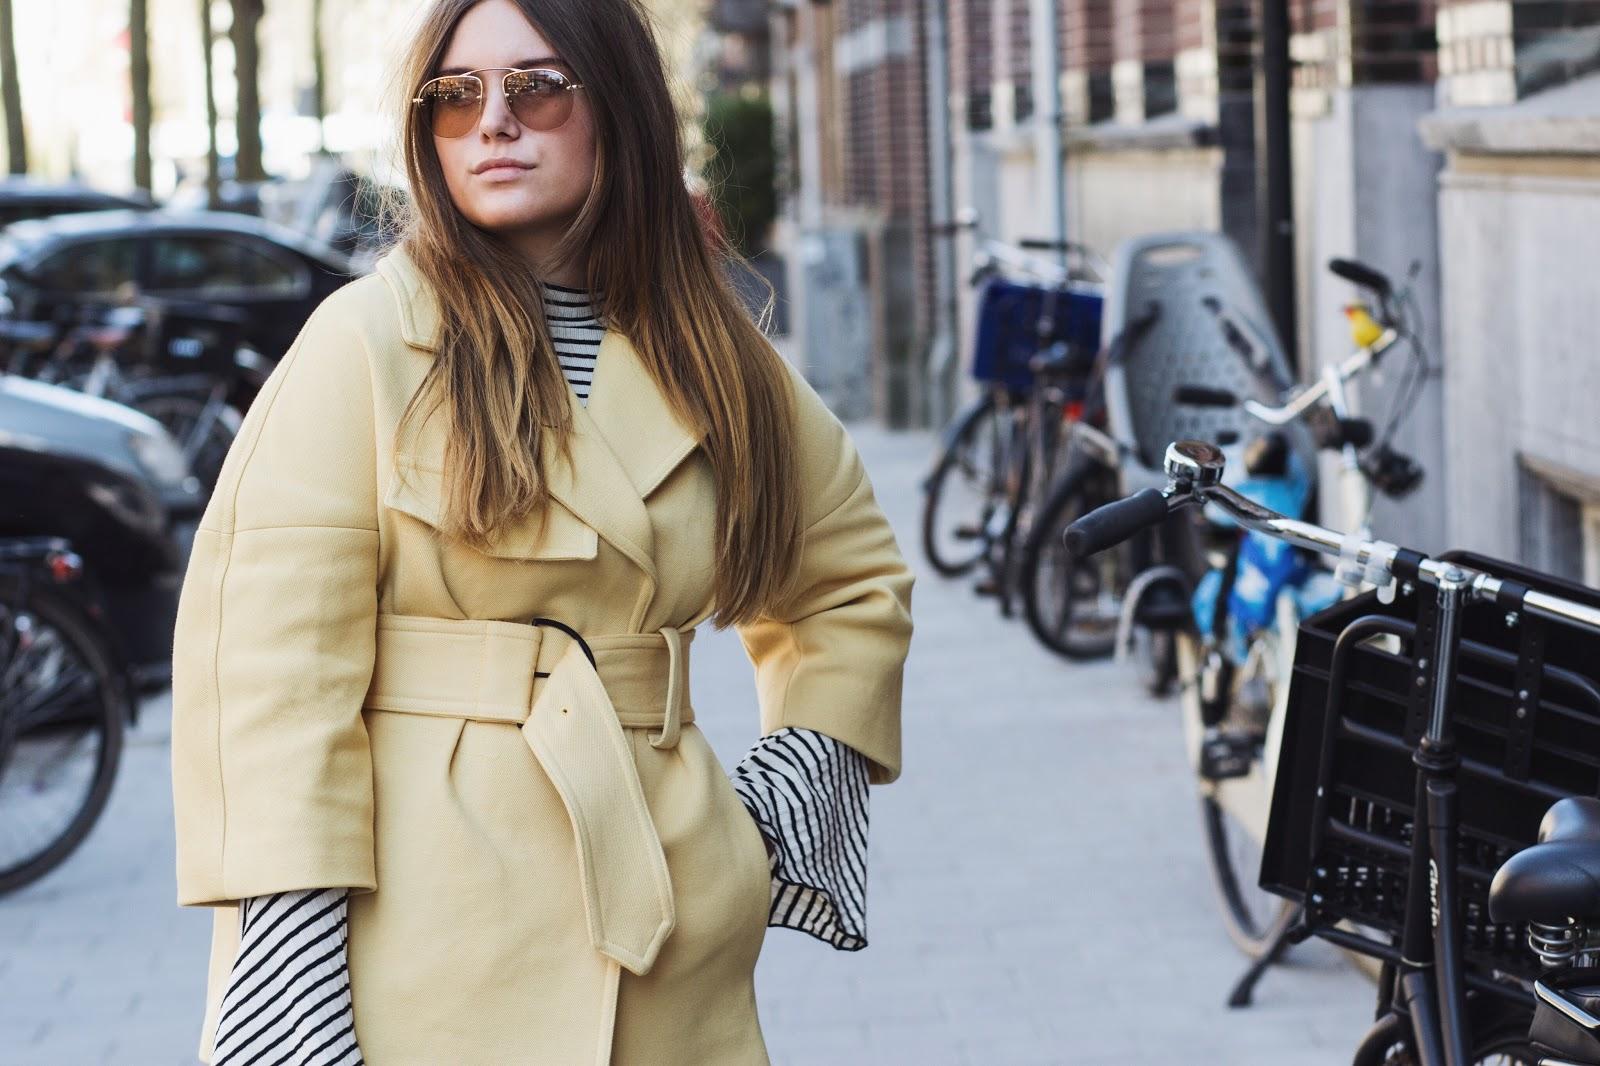 blogger Dominique Candido deau wearing a mango coat prada sunglasses balenciaga boots j brand jeans and a chanel bag